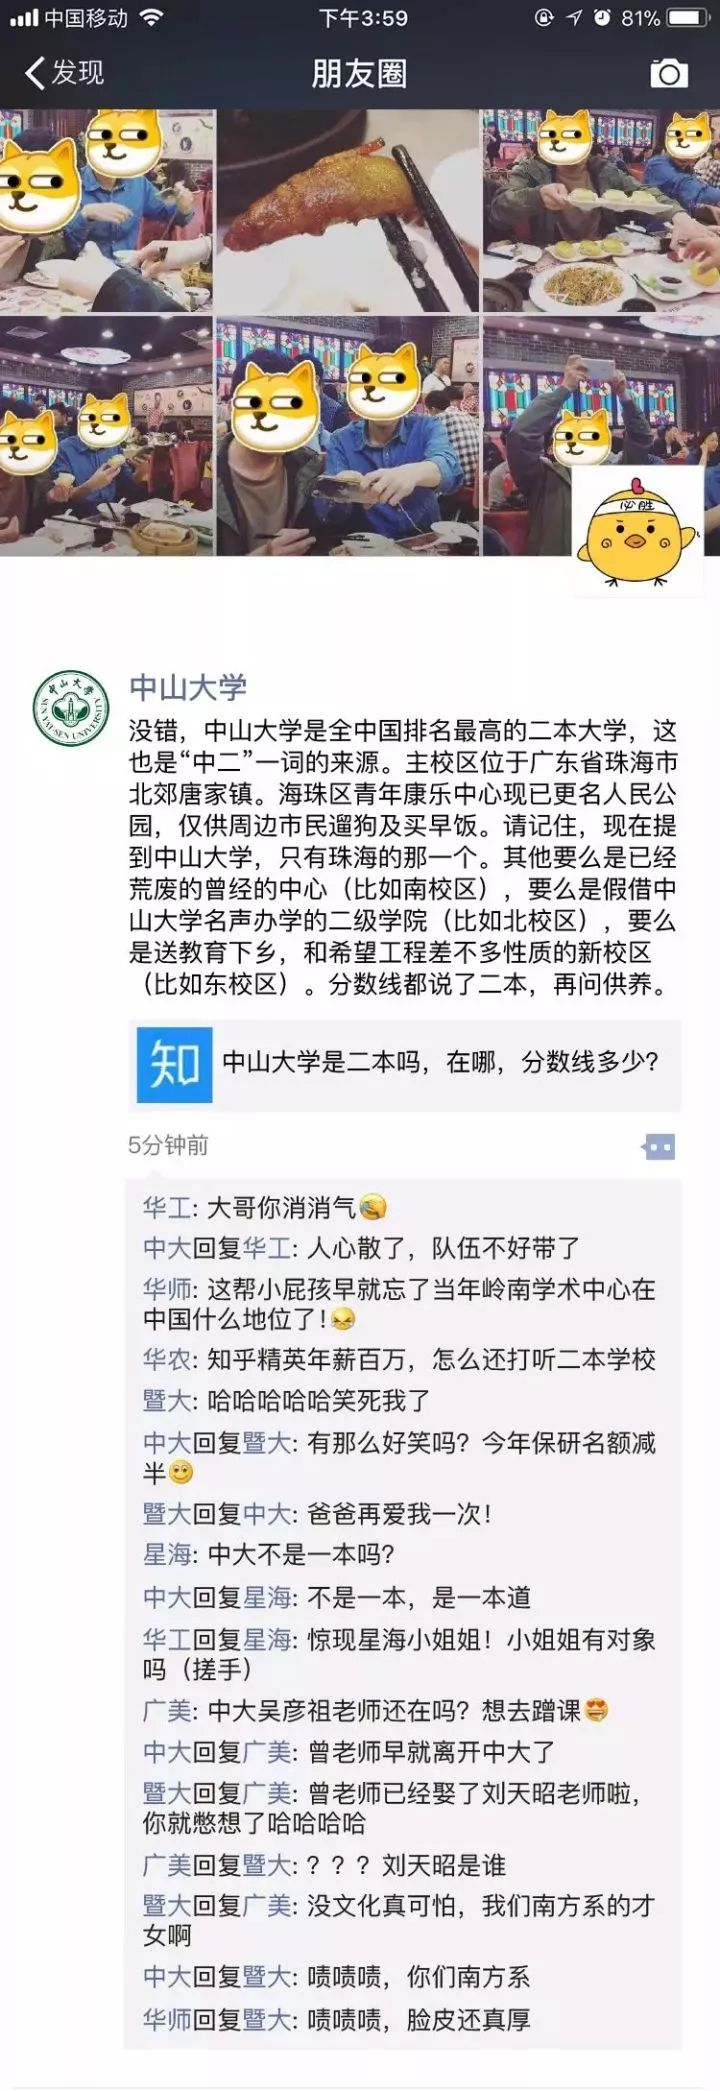 <b>广东各高校的沙雕朋友圈,哈哈哈哈够我笑一年</b>